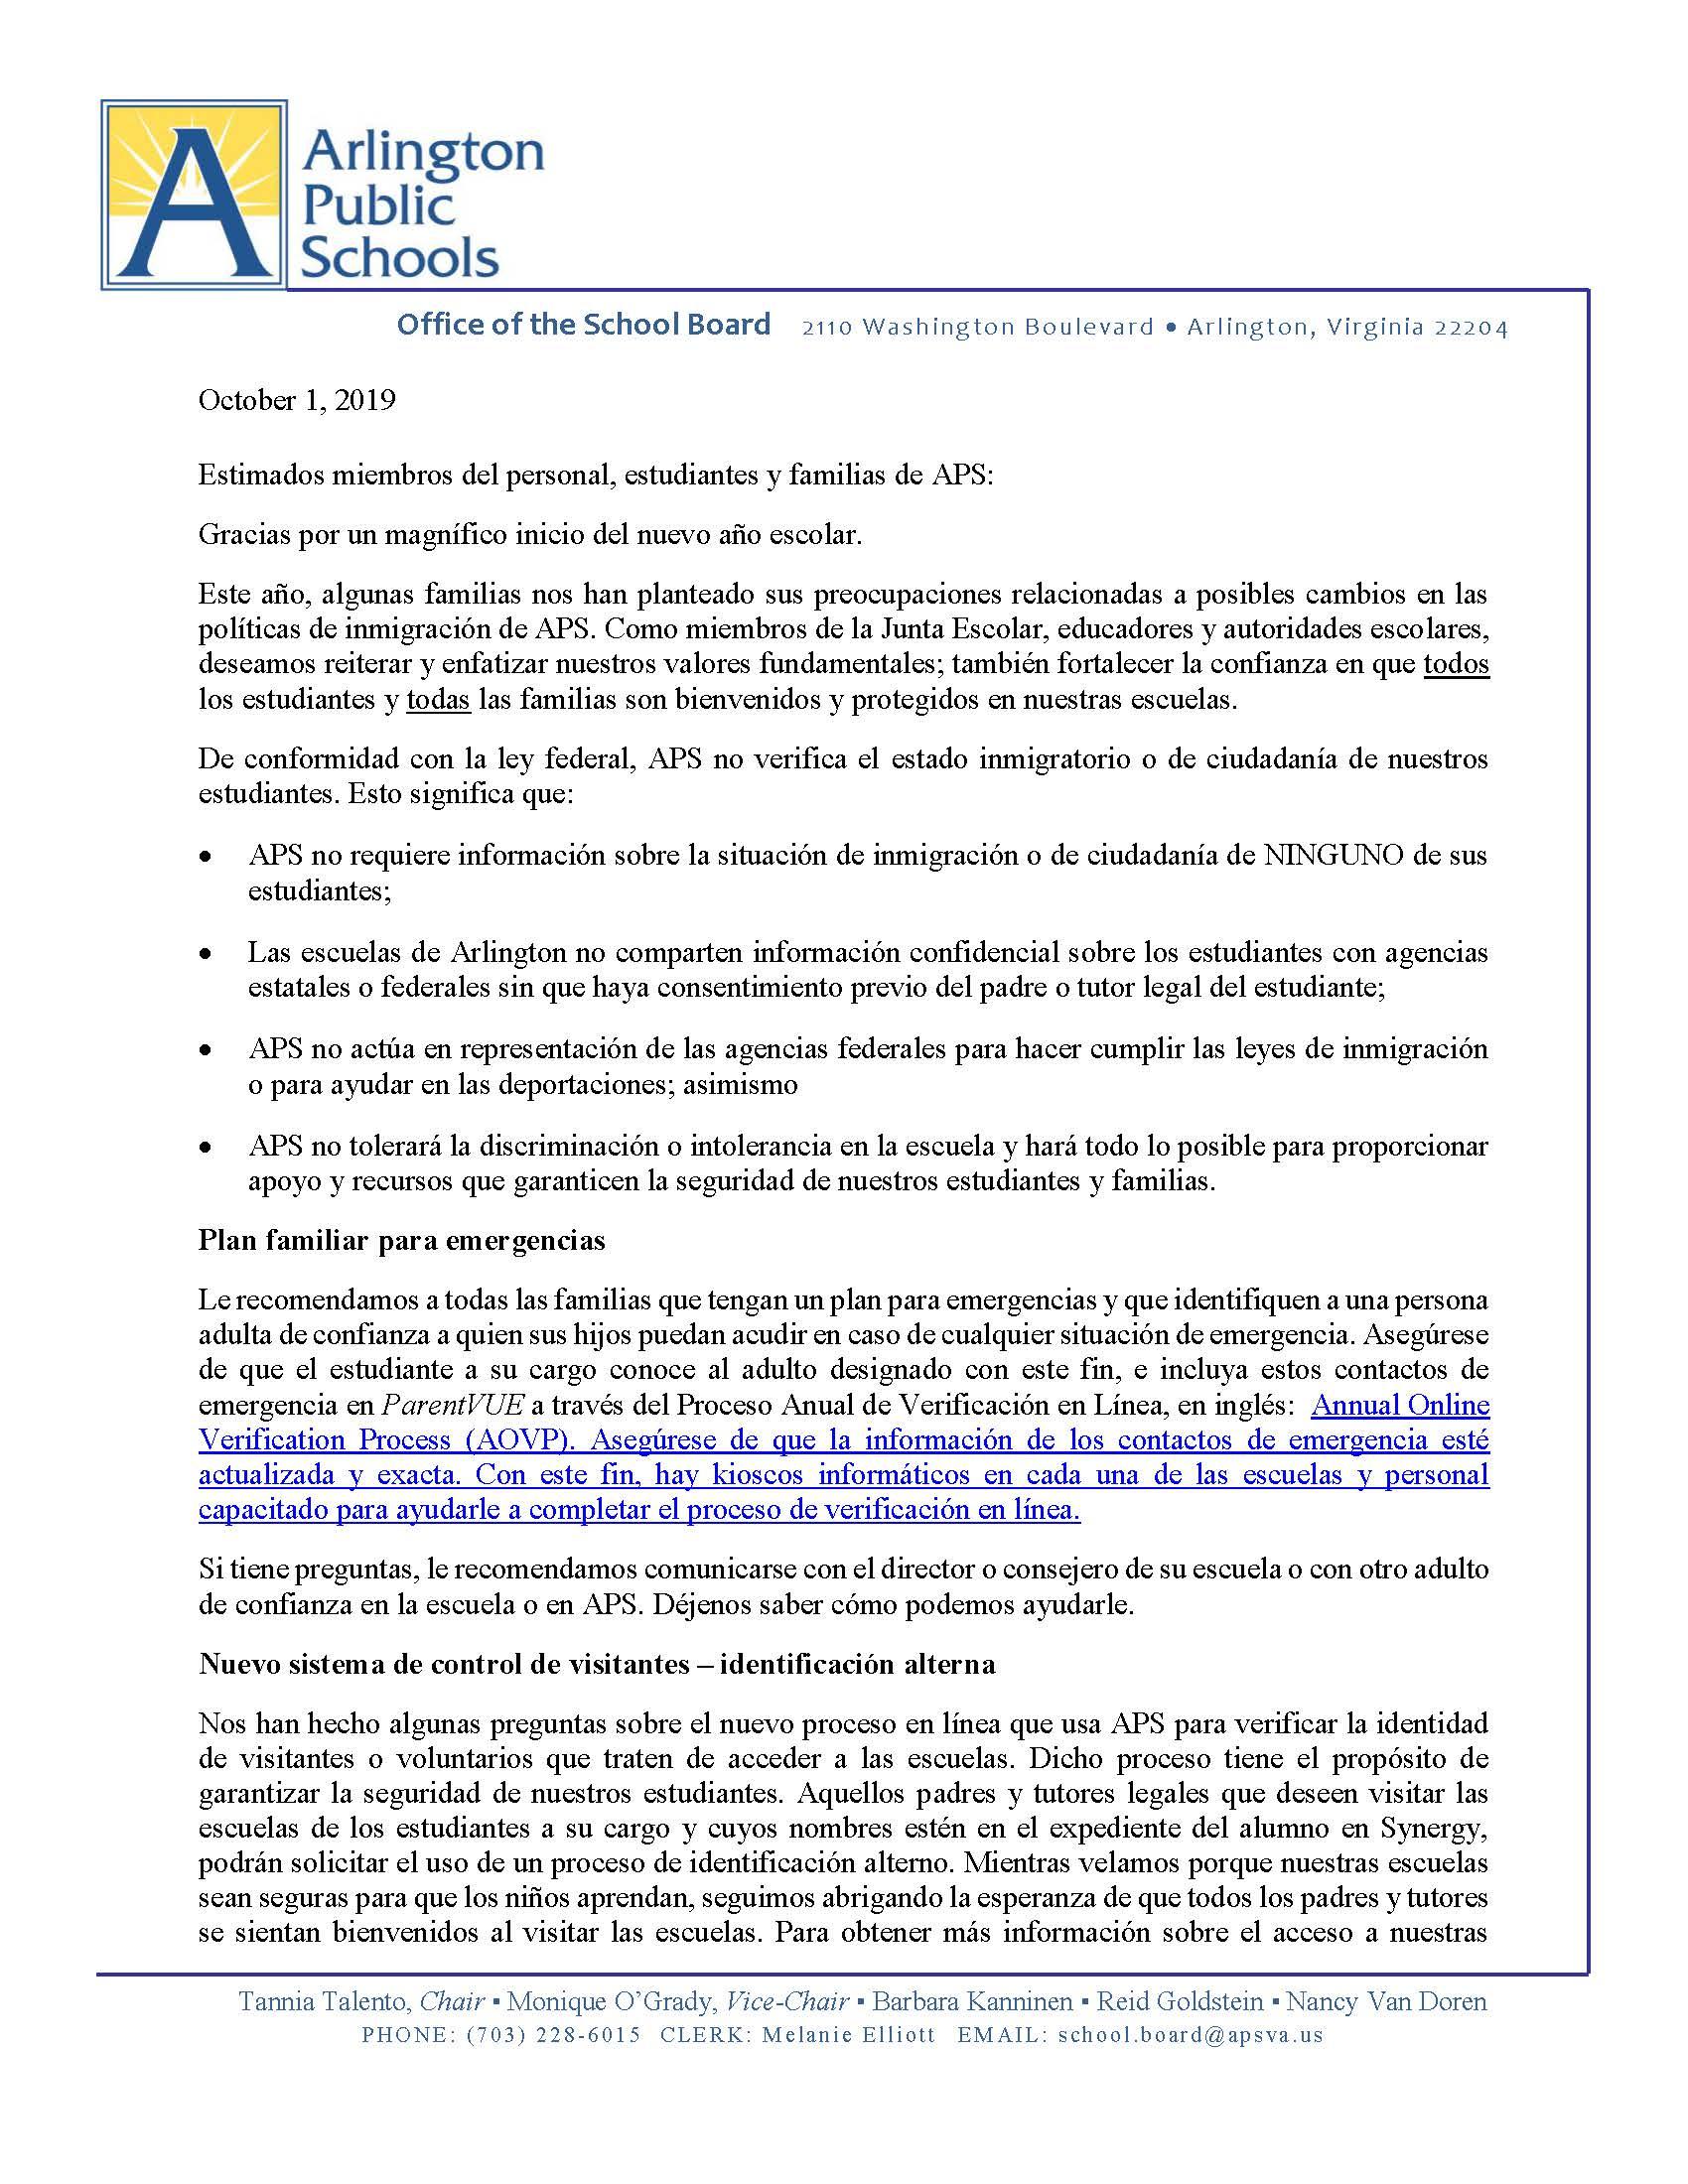 Immigration Letter to Families/Carta de Inmigración a las Familias